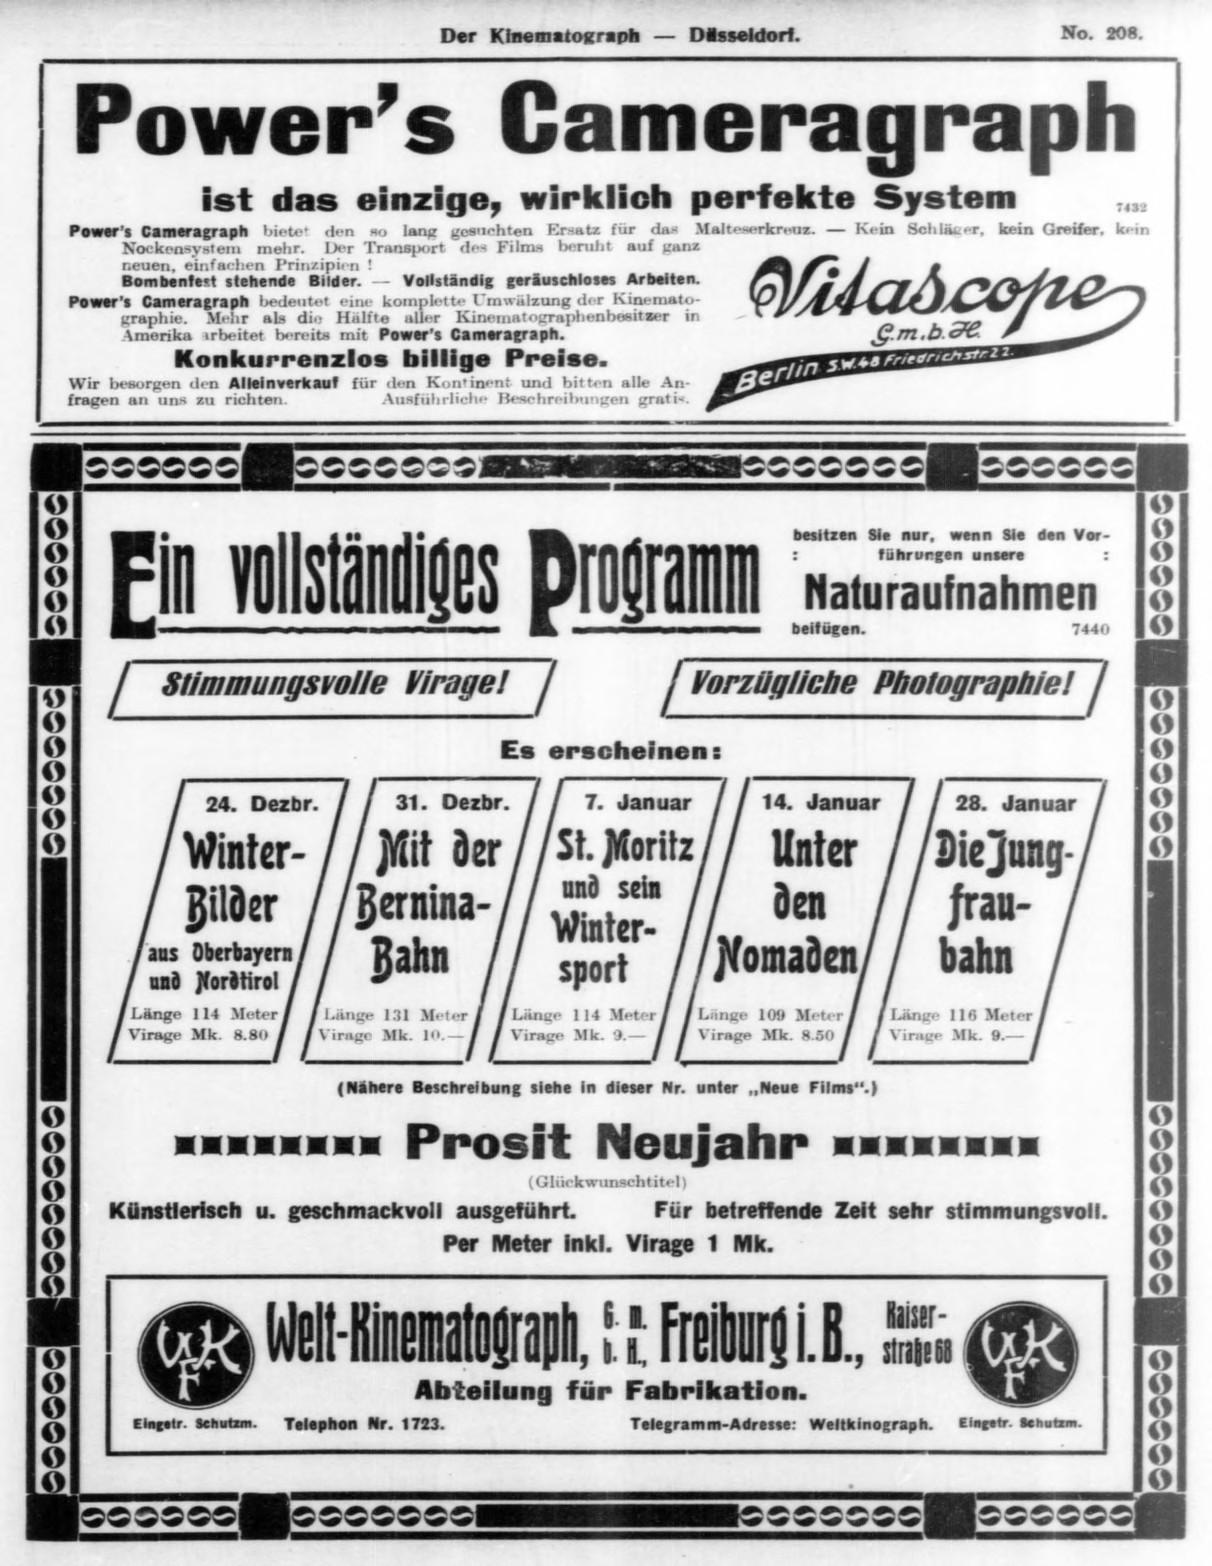 Kinematograph04-1910-12_jp2.zip&file=kinematograph04-1910-12_jp2%2fkinematograph04-1910-12_0068